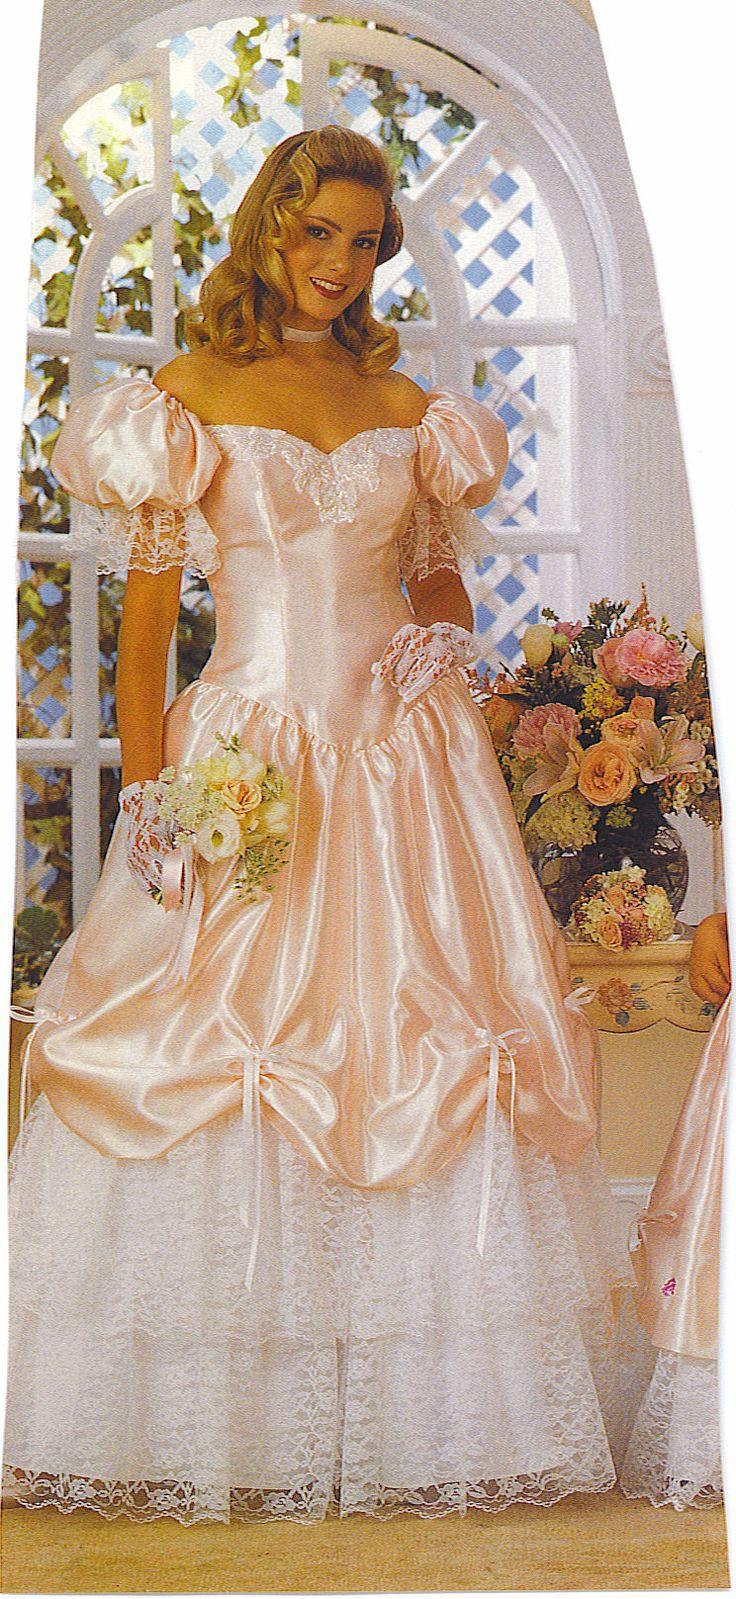 best crossdressers images on pinterest pretty homecoming dresses